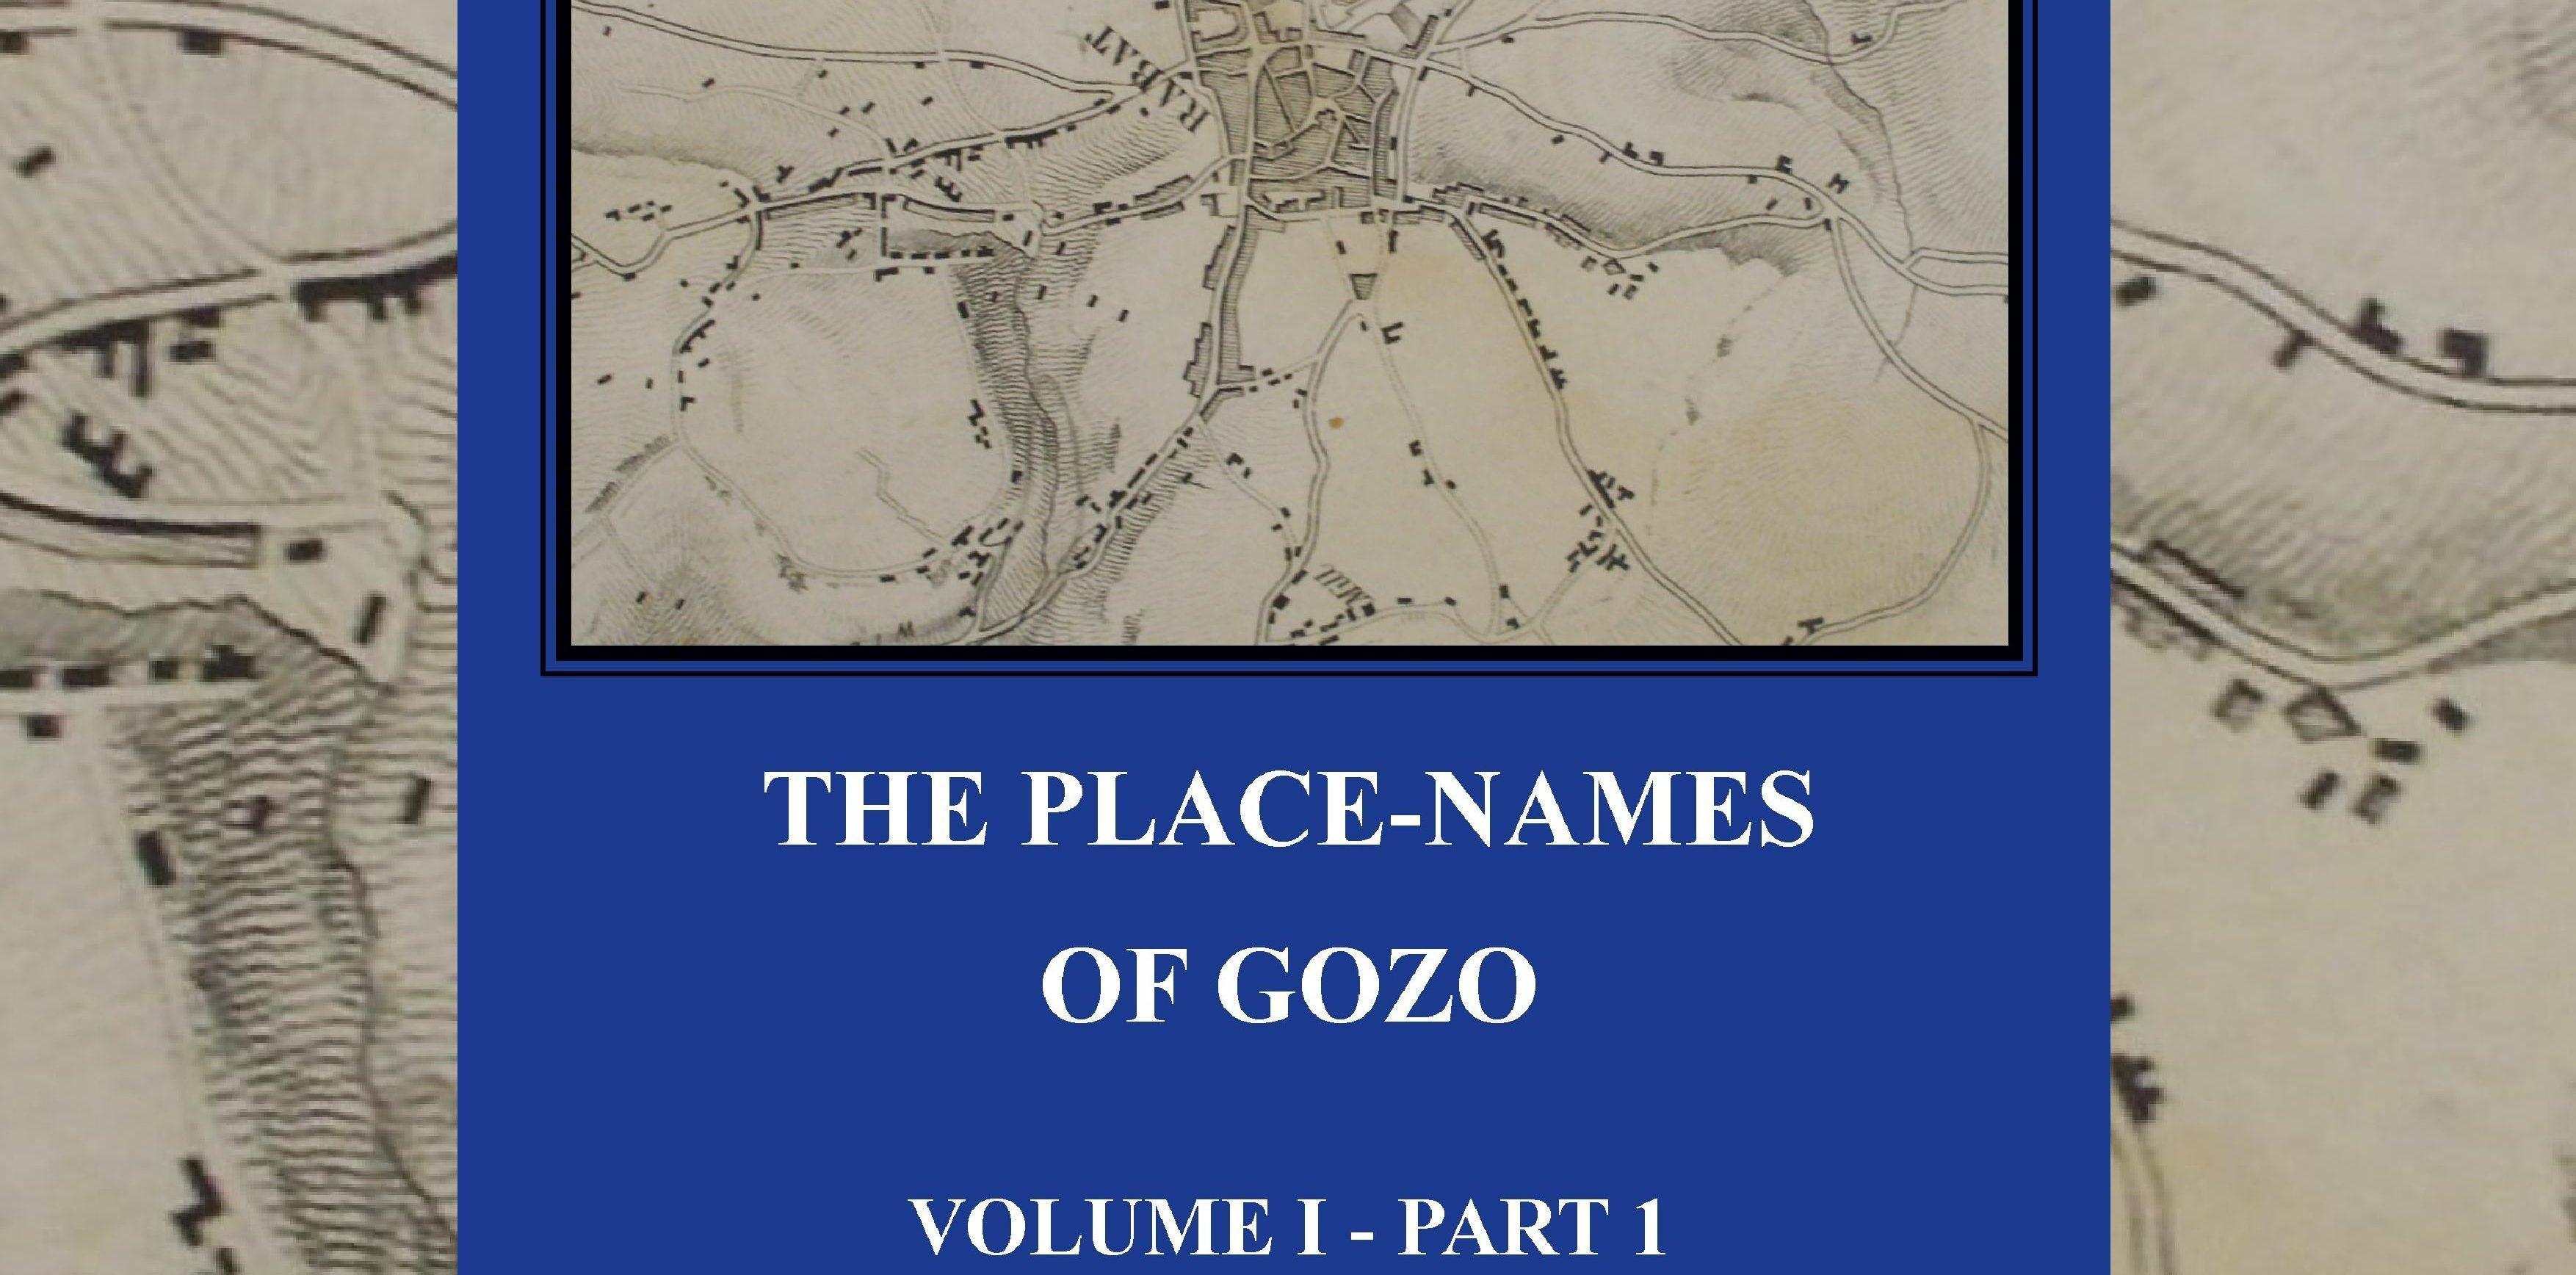 The Place-Names of Gozo by Simon Salafia- Vol. 1